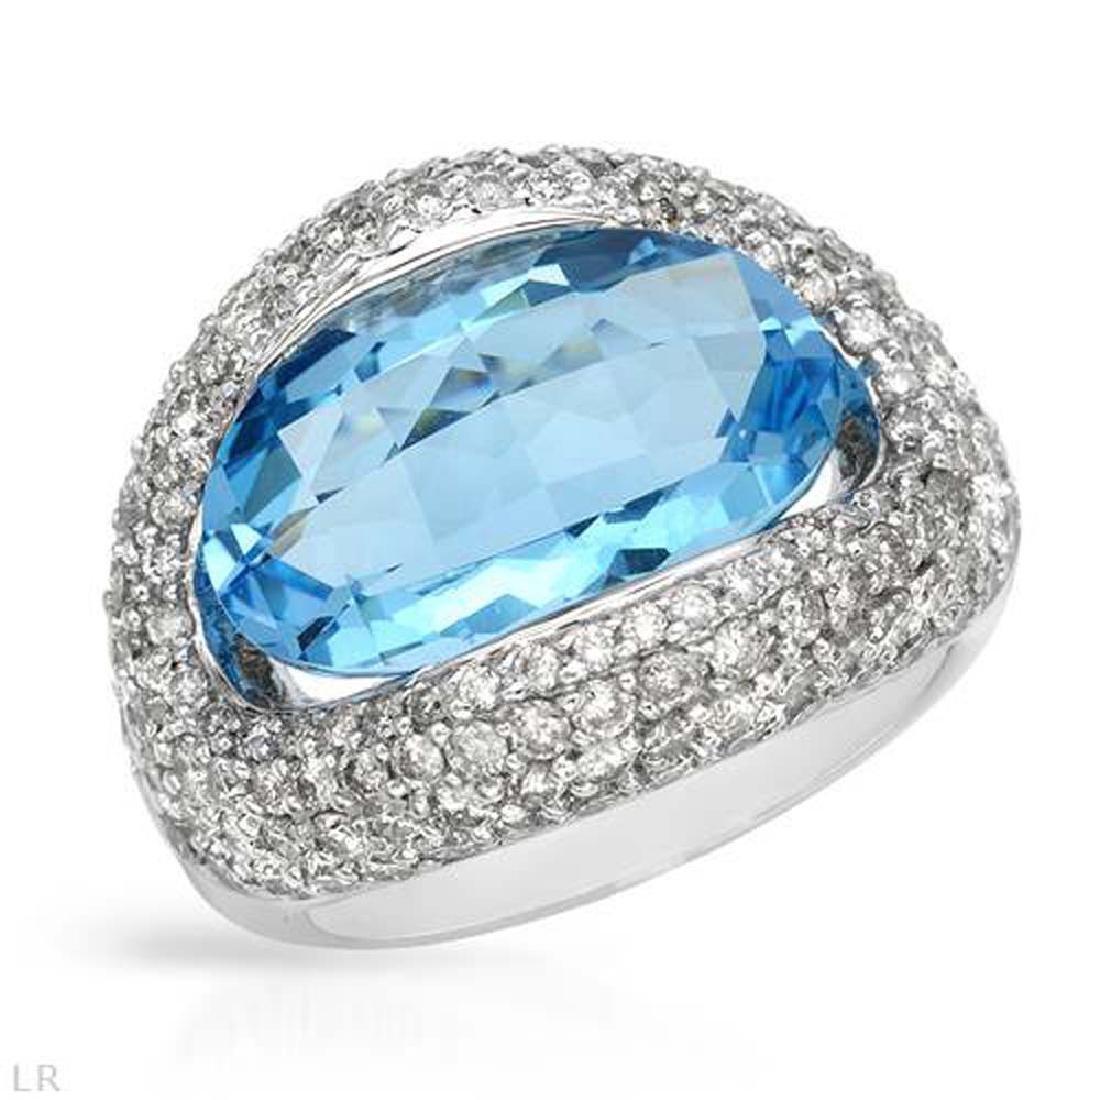 Genuine 12.96 TCW 14K White Gold Ladies Ring